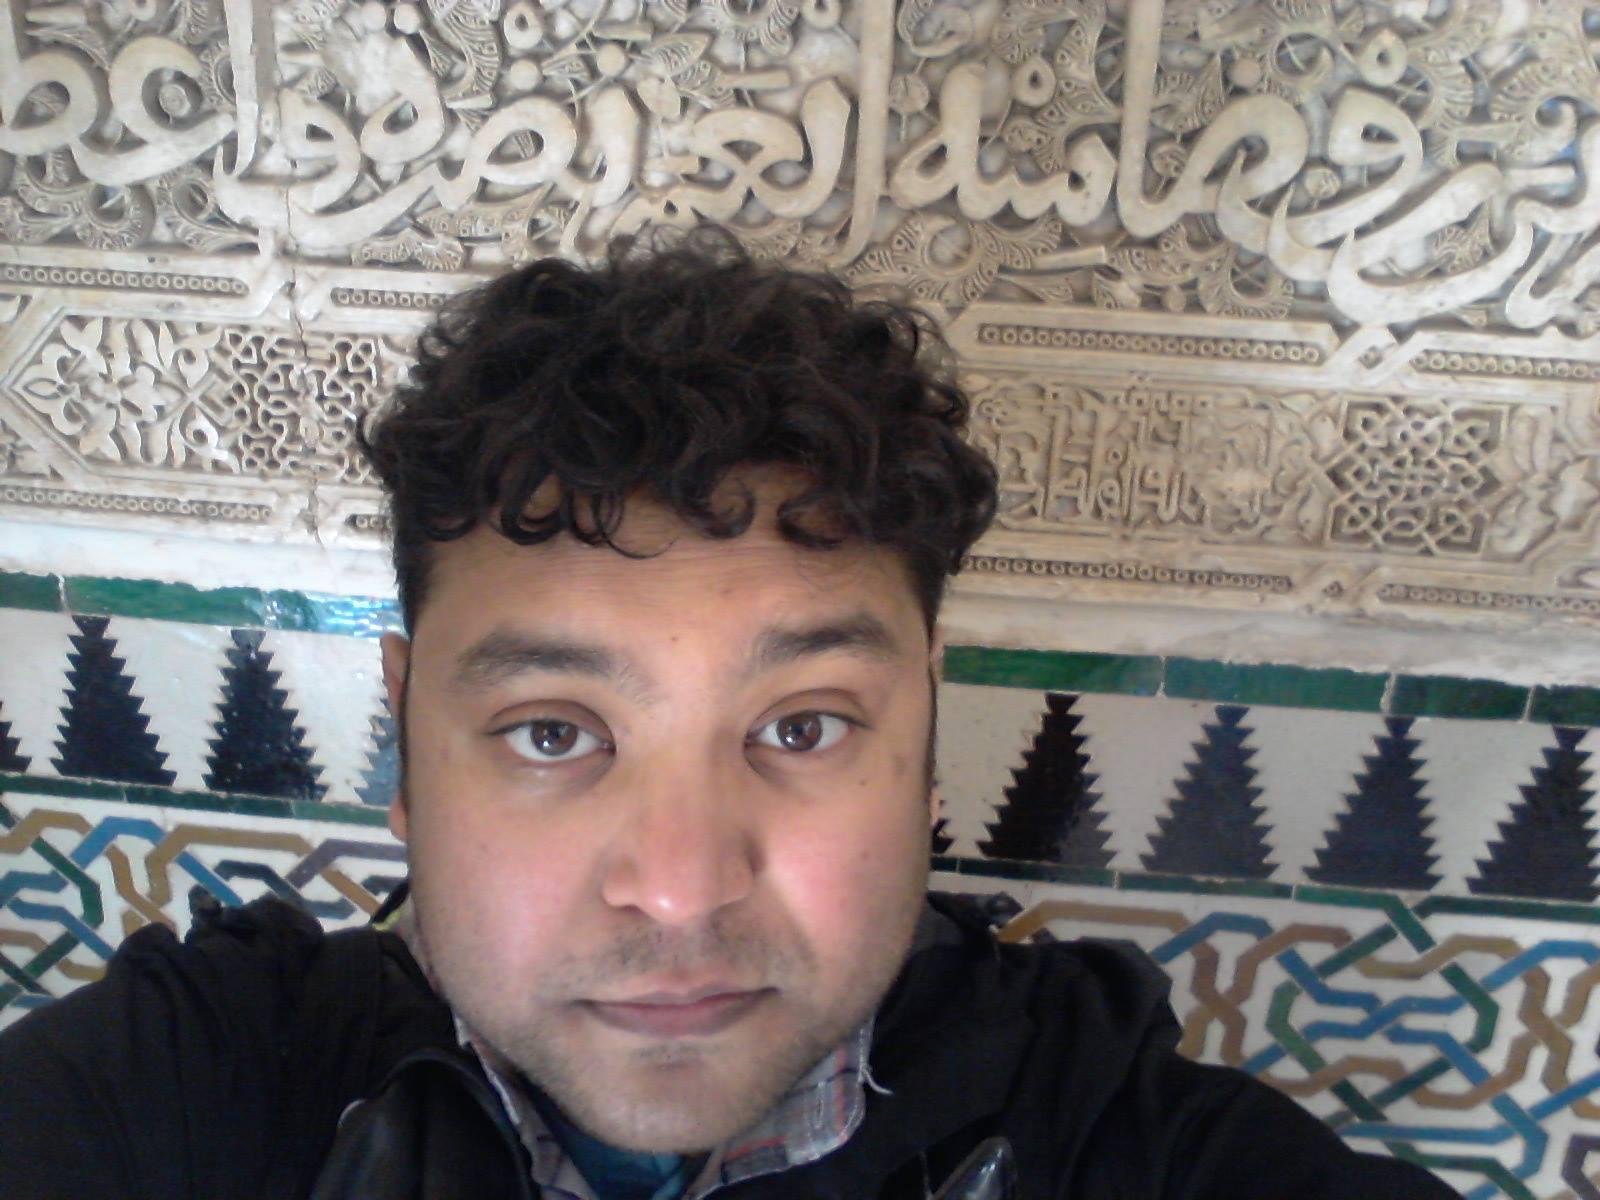 Inside the Nasrid Palace